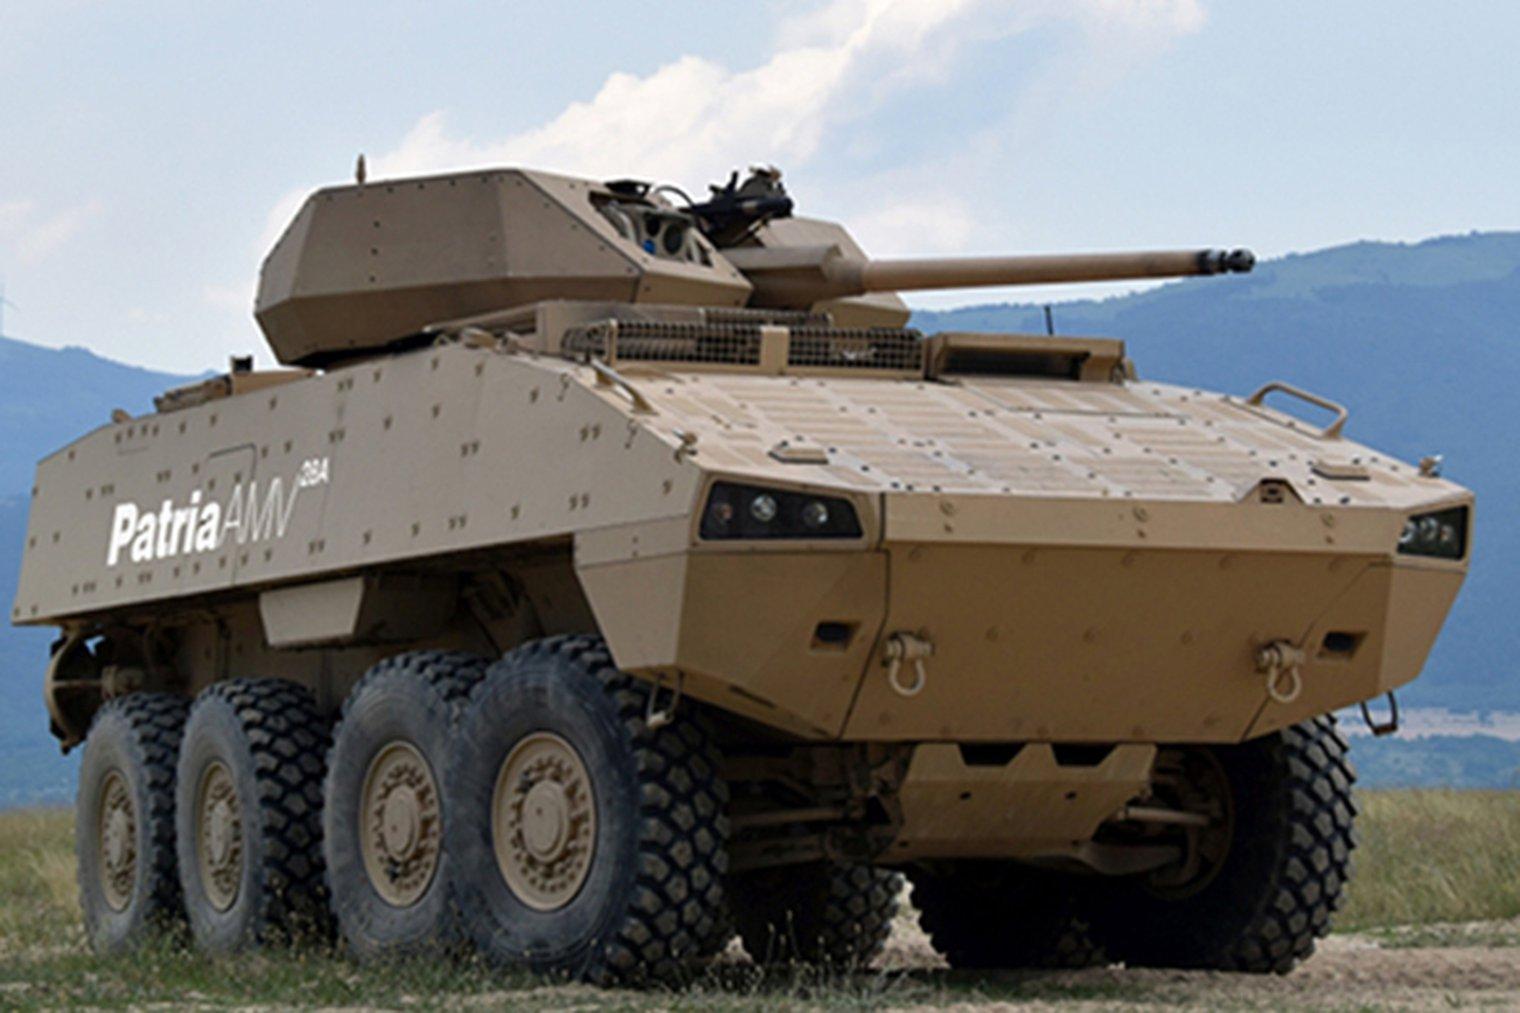 Patria AMV (Armored Modular Vehicle)   AIIRSOURCE